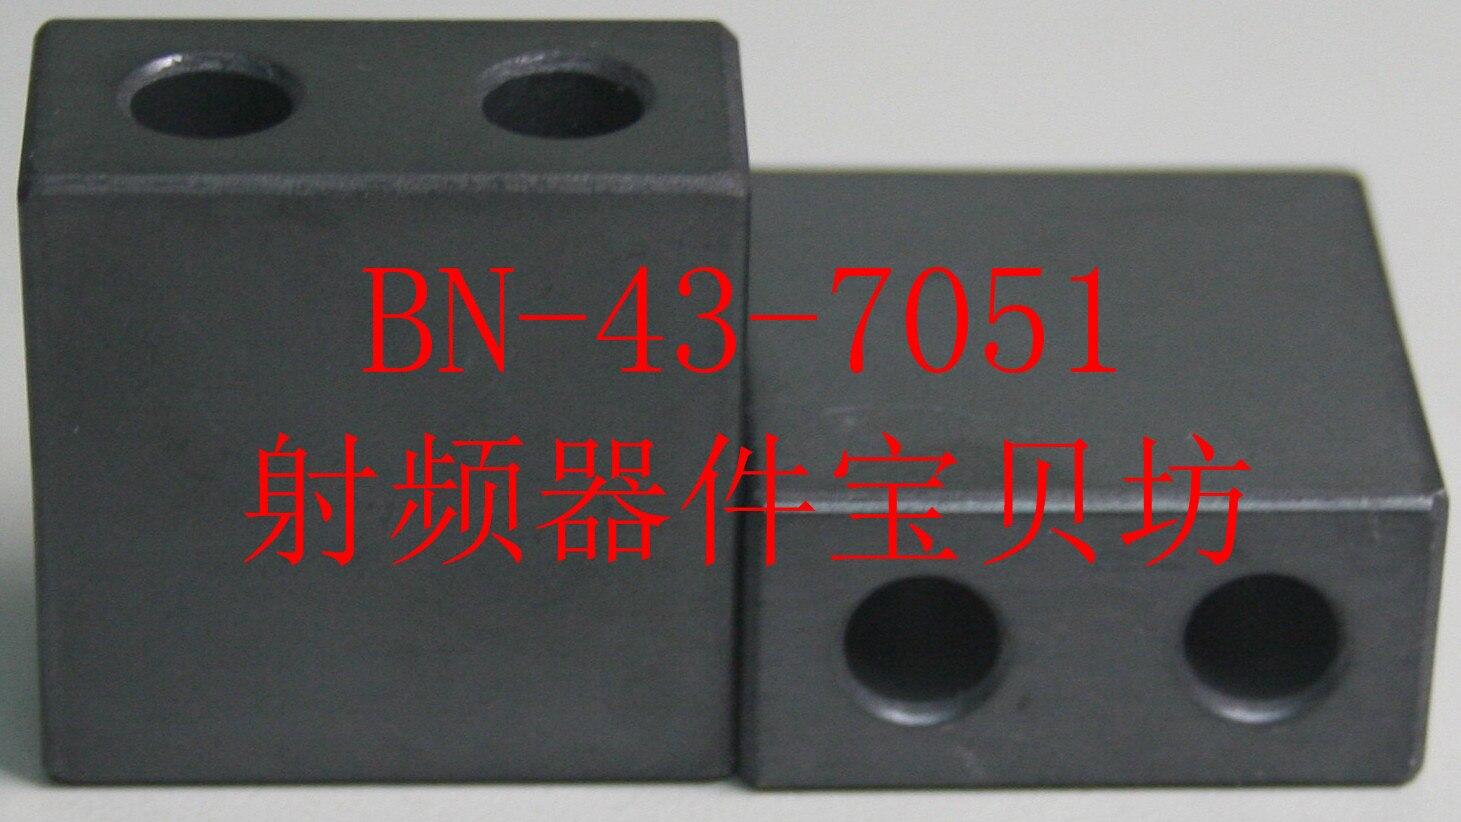 American RF Double Hole Ferrite Core BN-43-7051